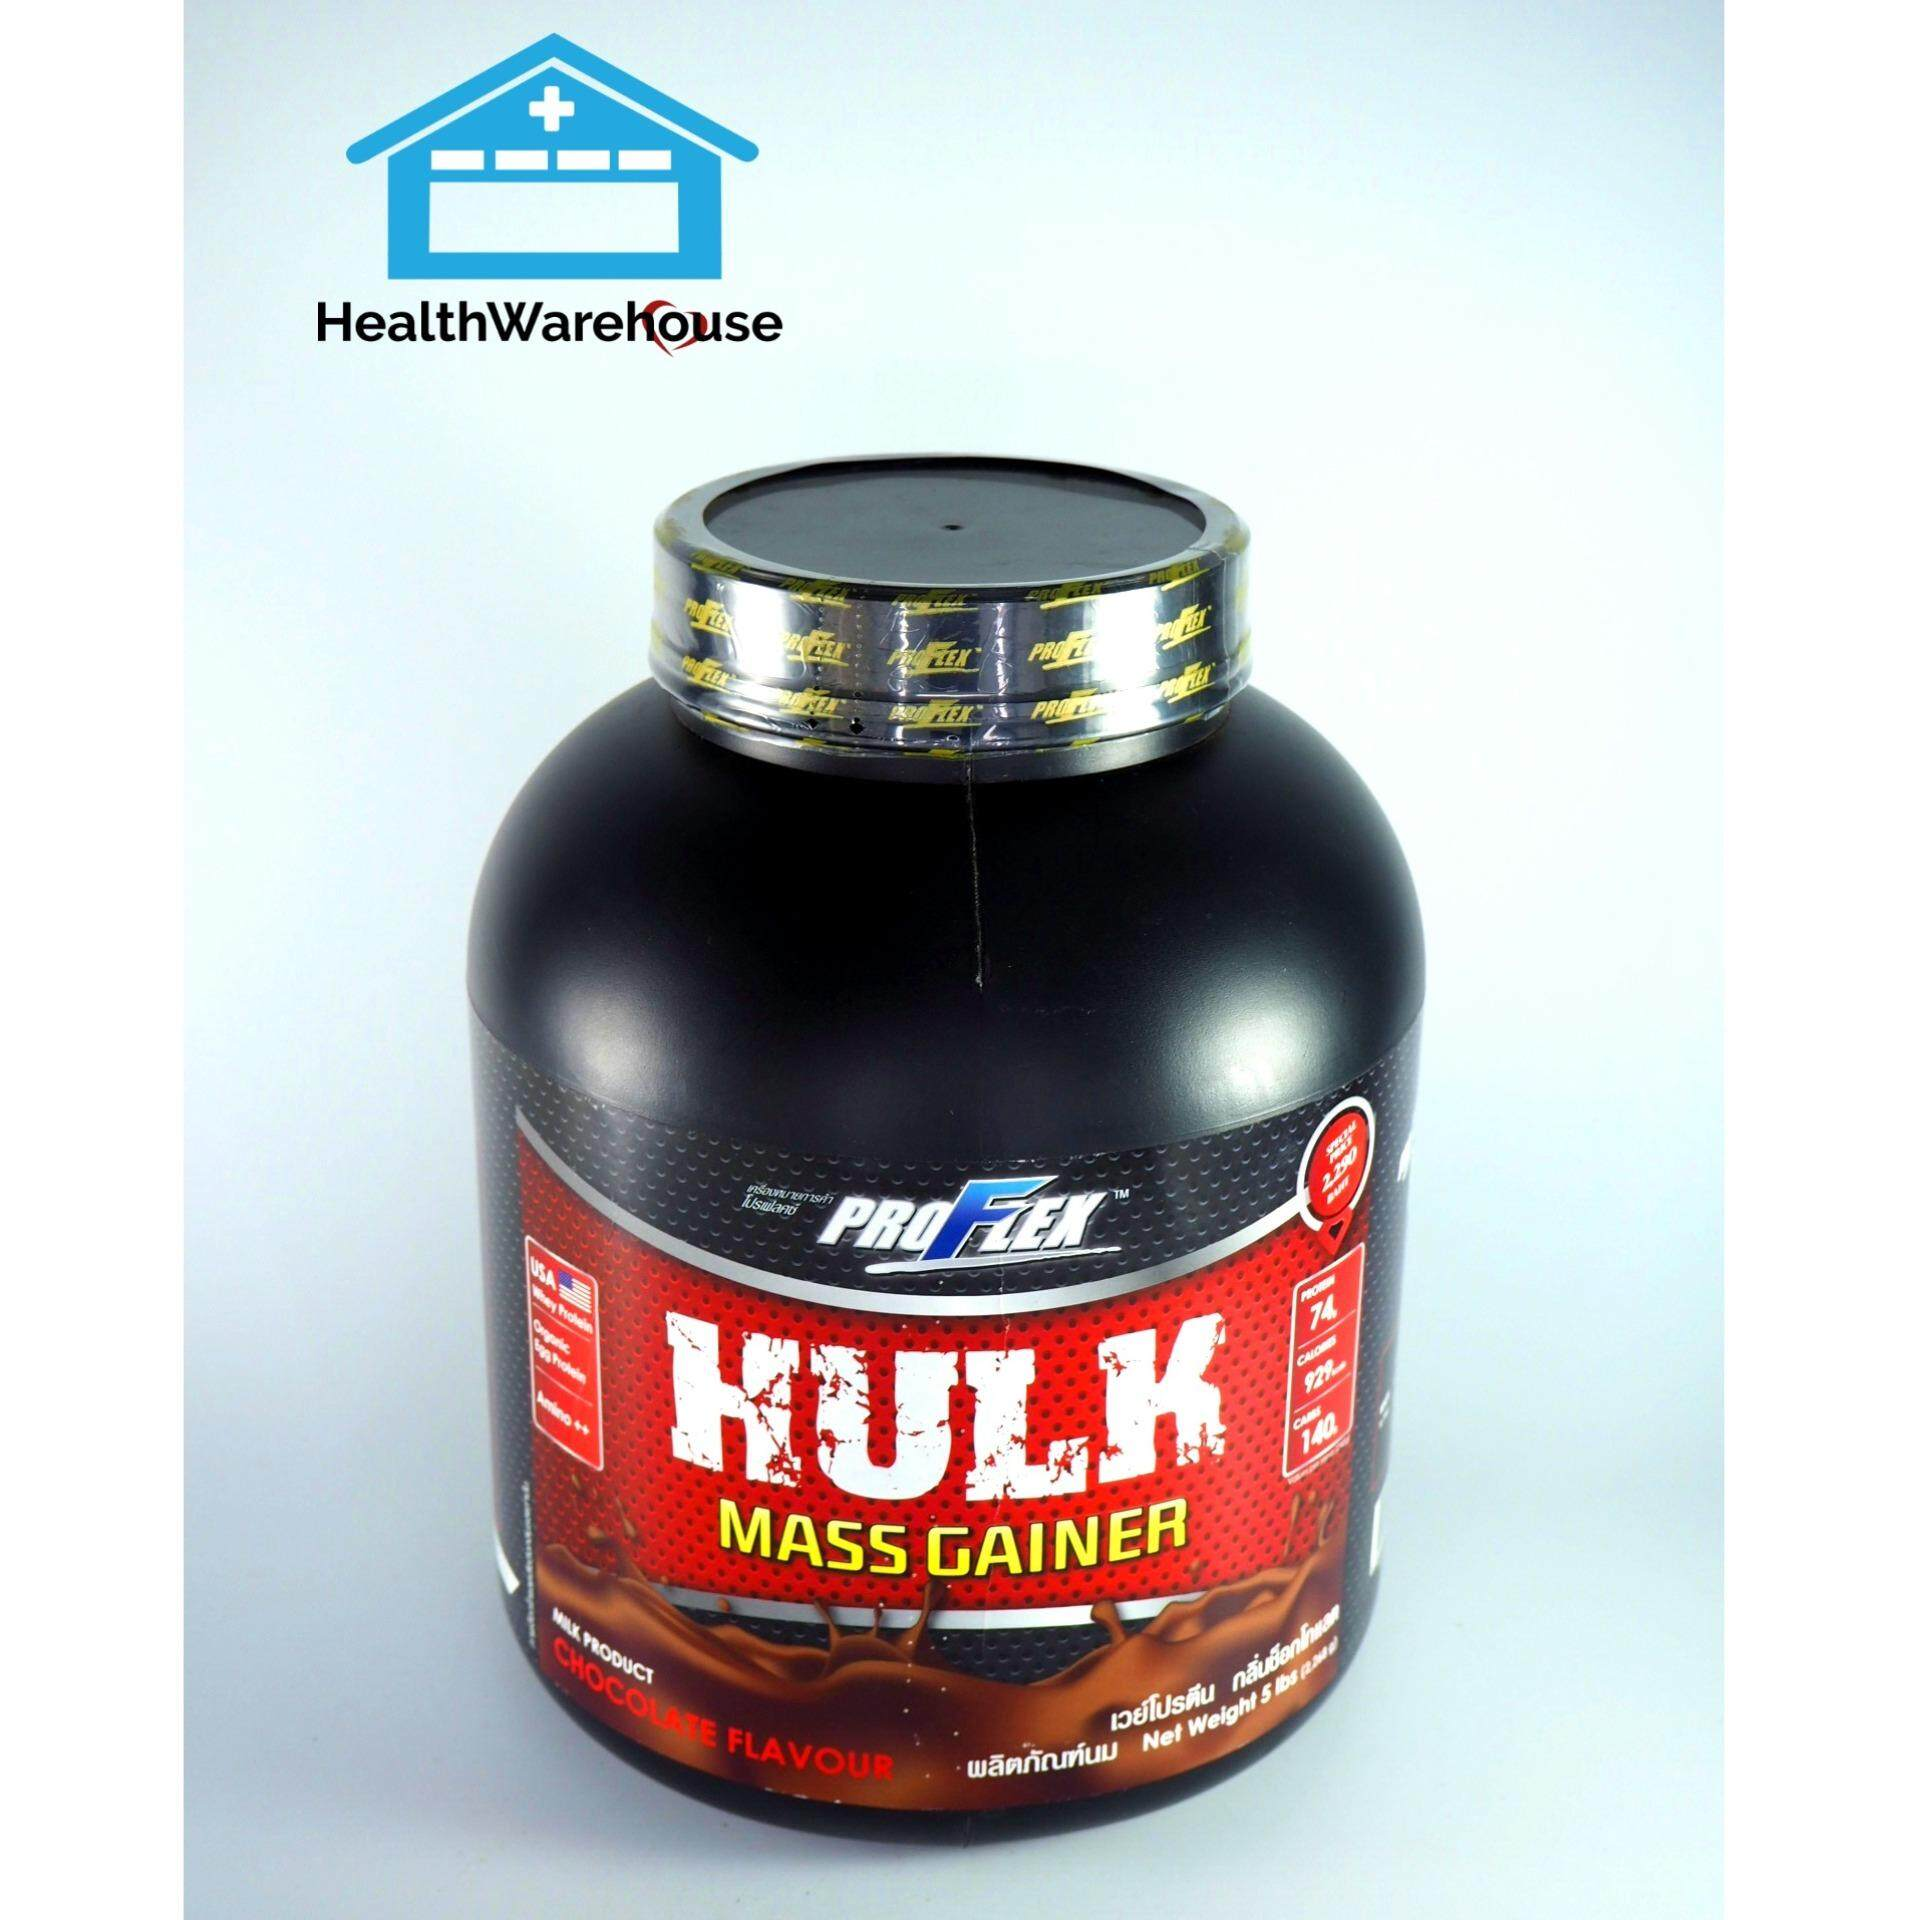 Proflex Hulk Mass Gainer Chocolate (5 Ibs.)